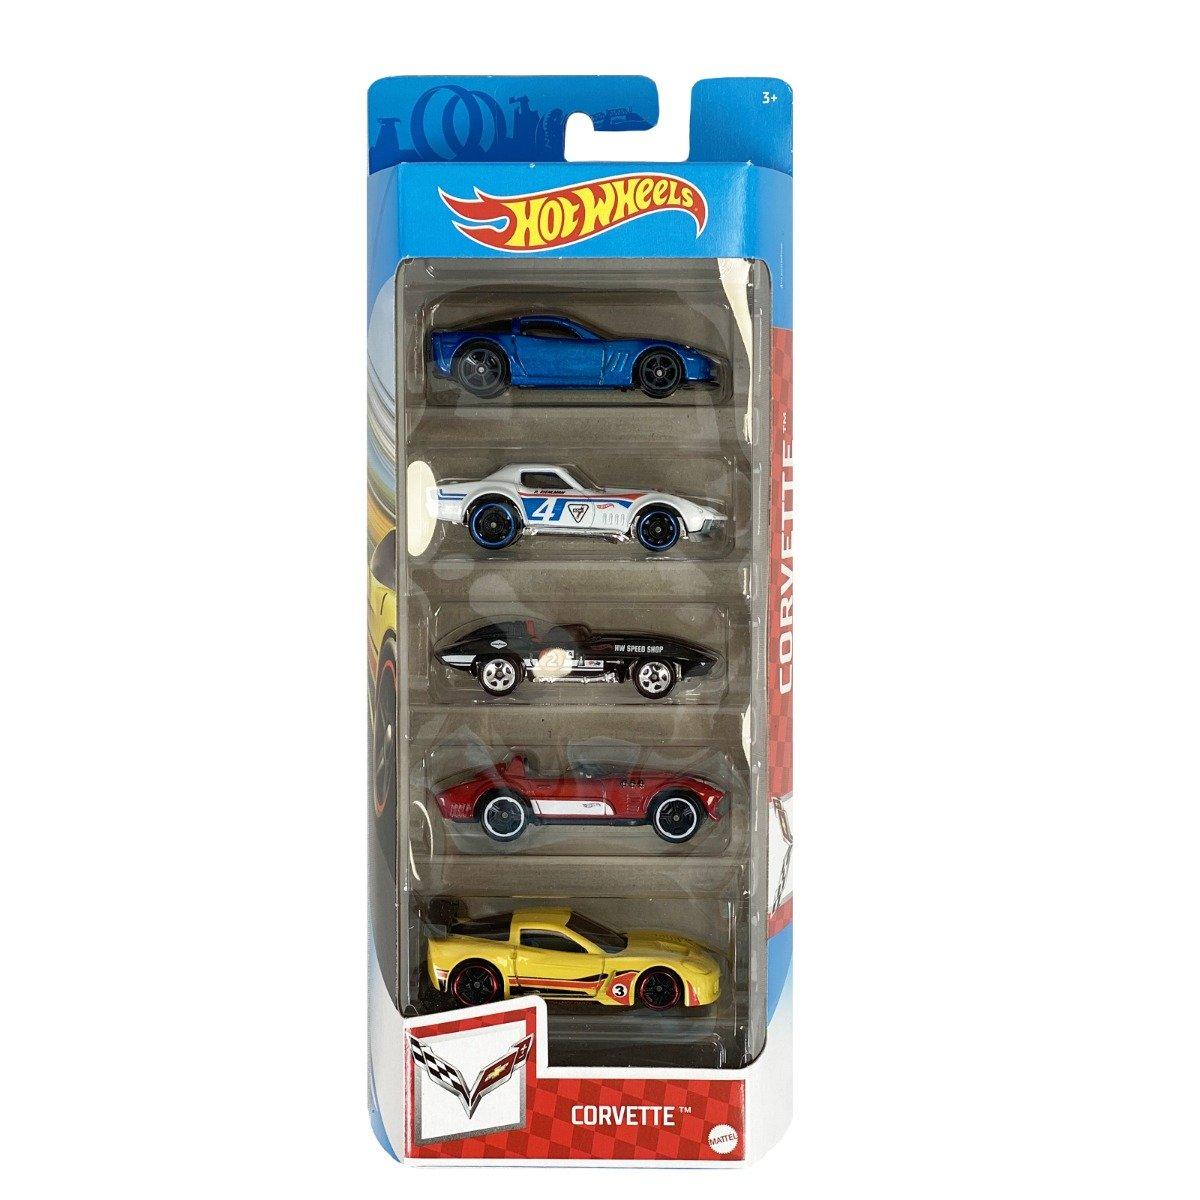 Set masinute Hot Wheels, Corvette, GTN35, 1:64 (5 modele)